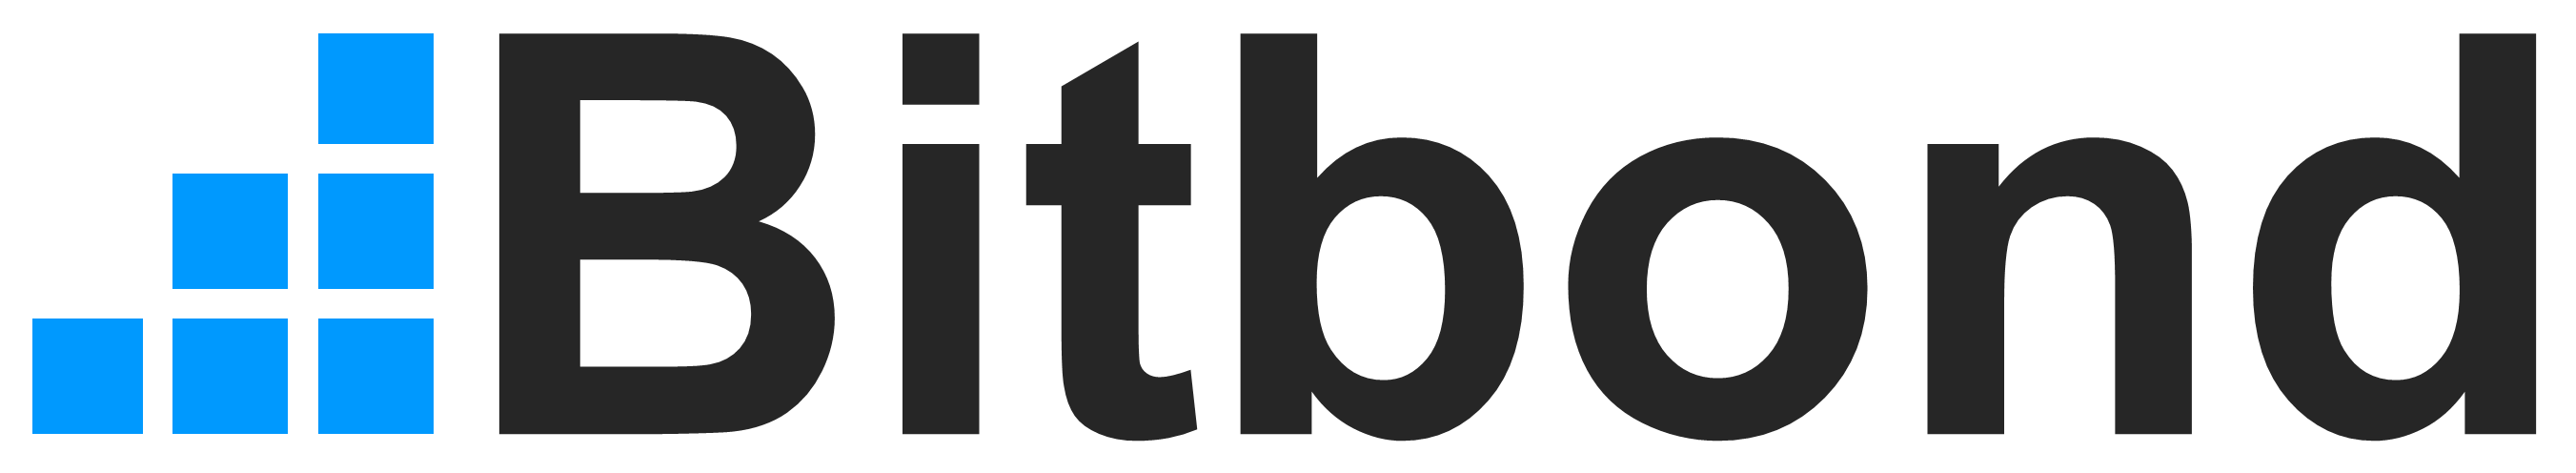 bitbond, bitbond test, bitbond erfahrunsgbericht, bitbond testbericht, bitbond seriös, bitbond kritik, bitbond gmbh